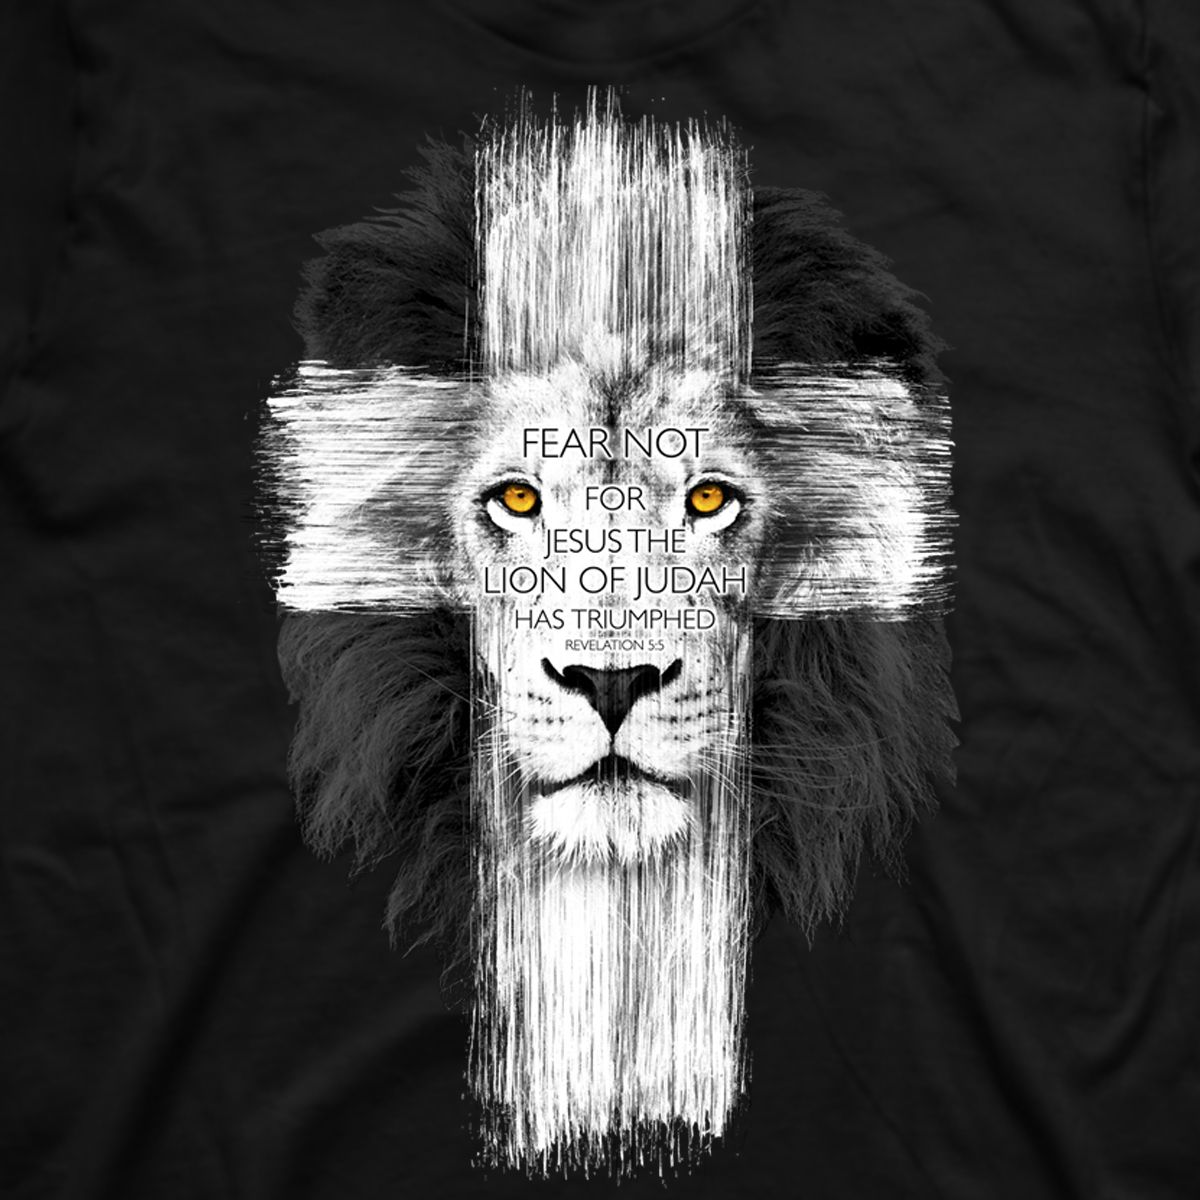 Black t shirt white cross - Christian T Shirt Shop Lion Of Judah Cross T Shirt Christ S Triumph